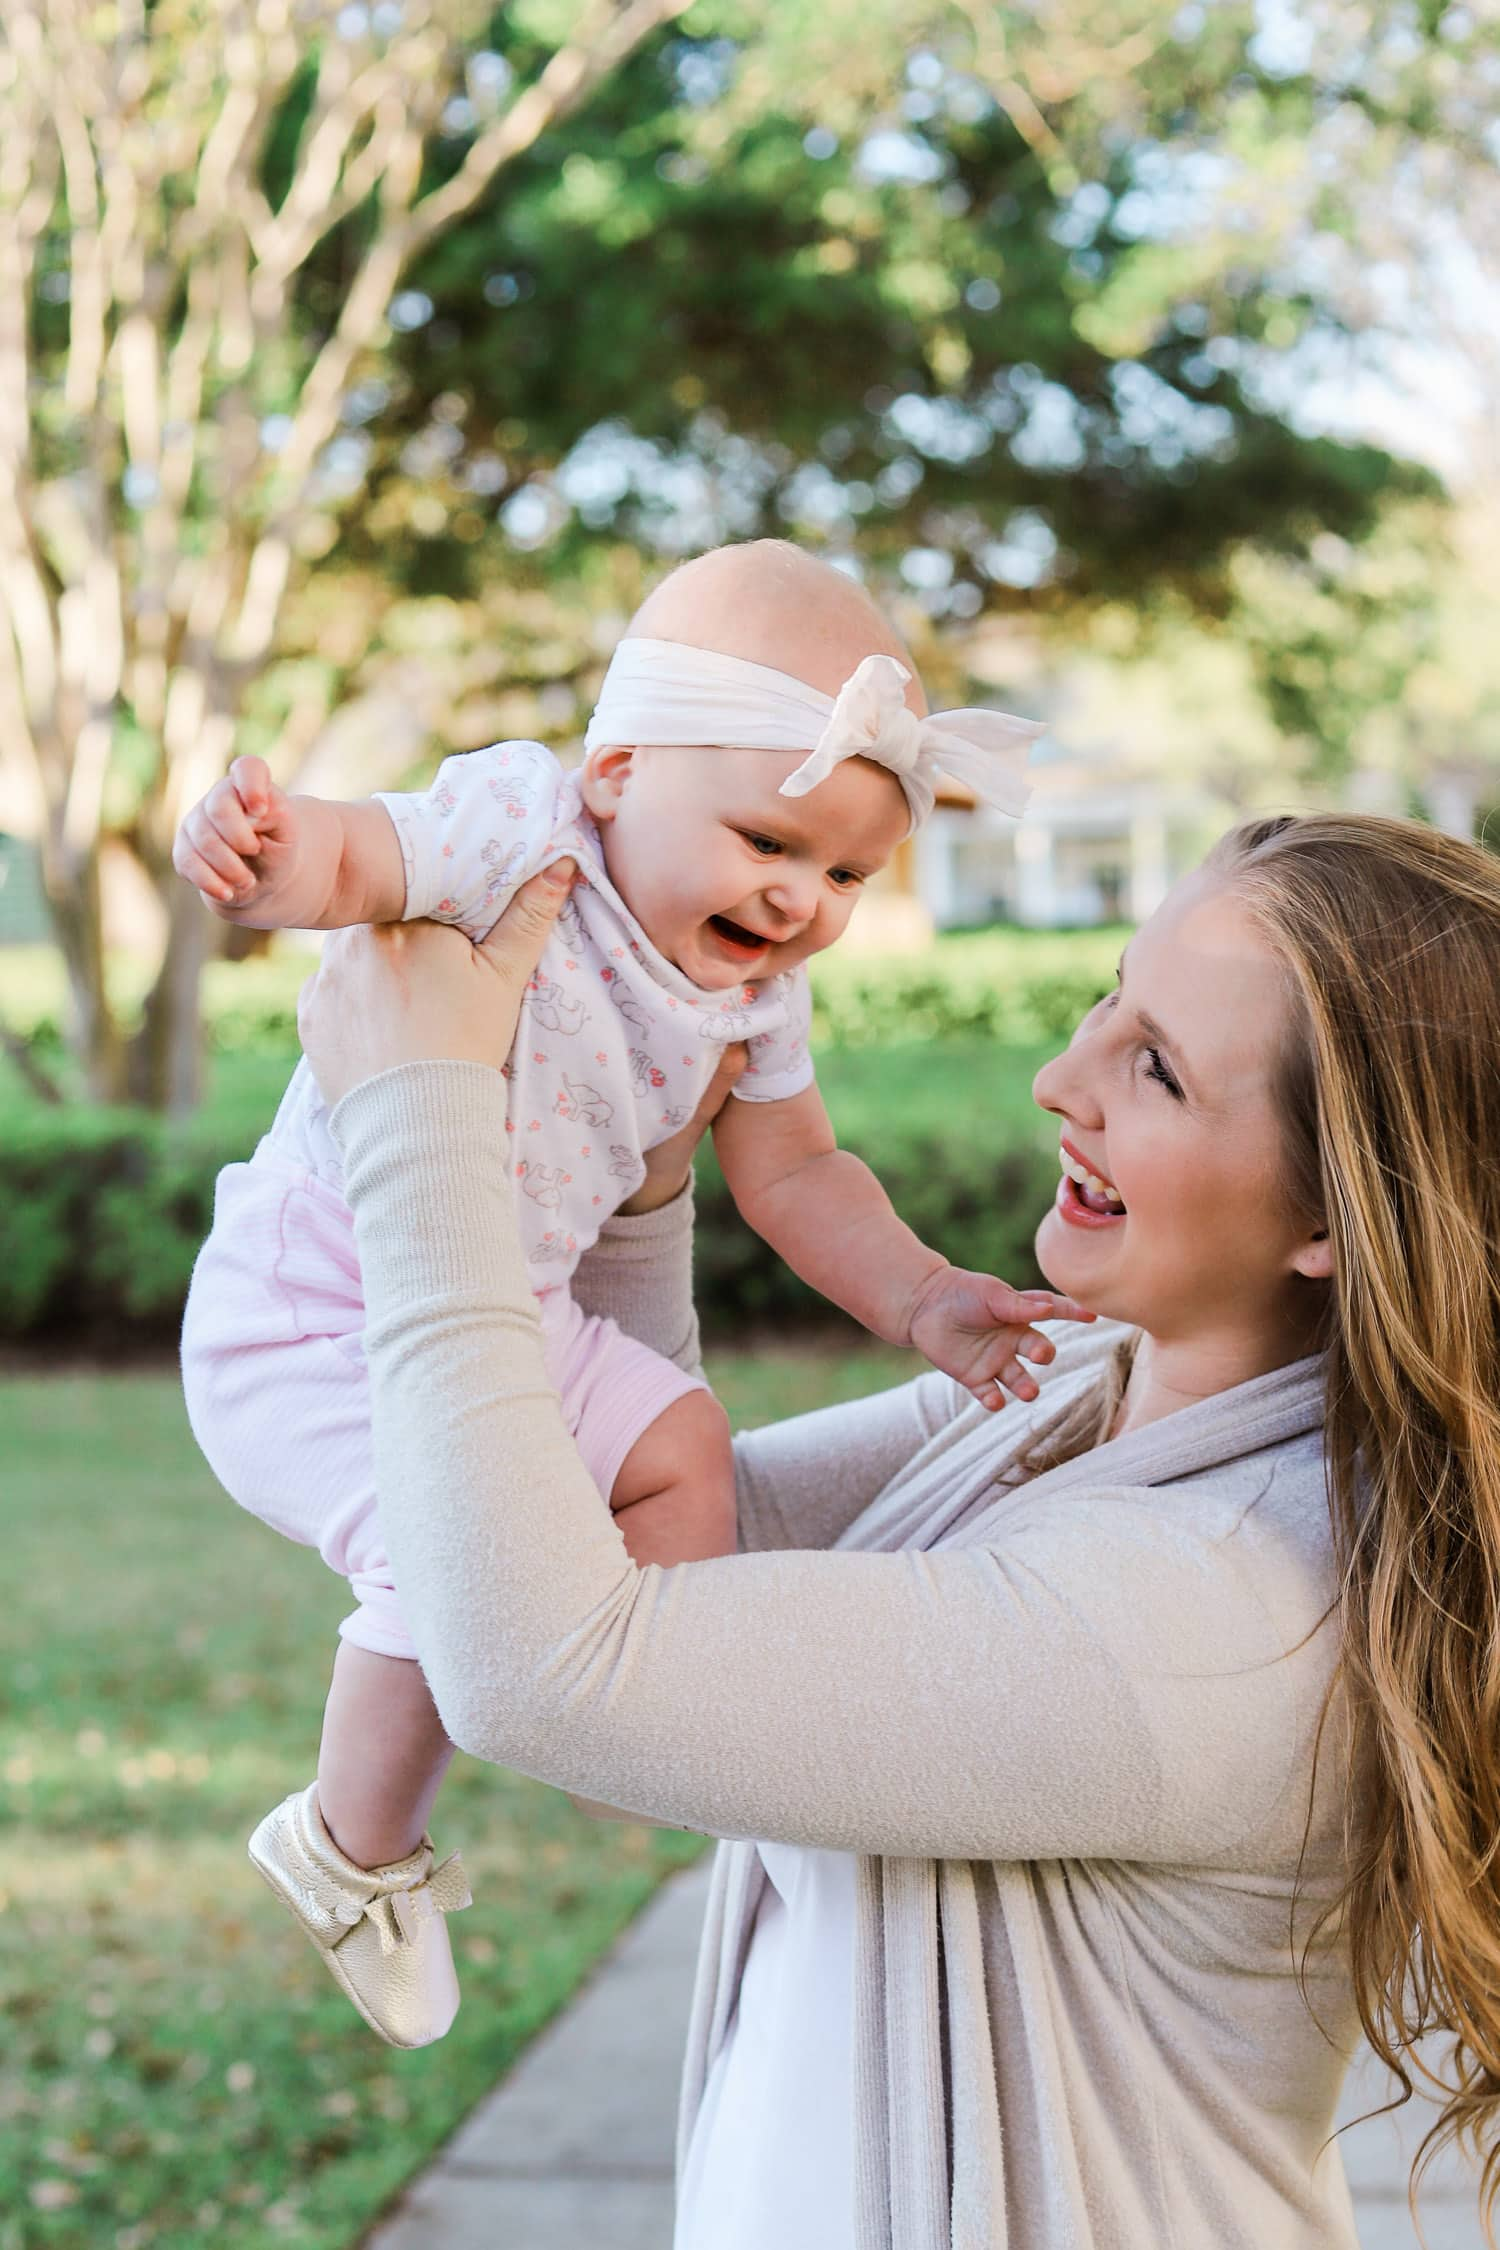 Ivory body wash, new baby, new mom, Ashley Brooke Nicholas, skin care